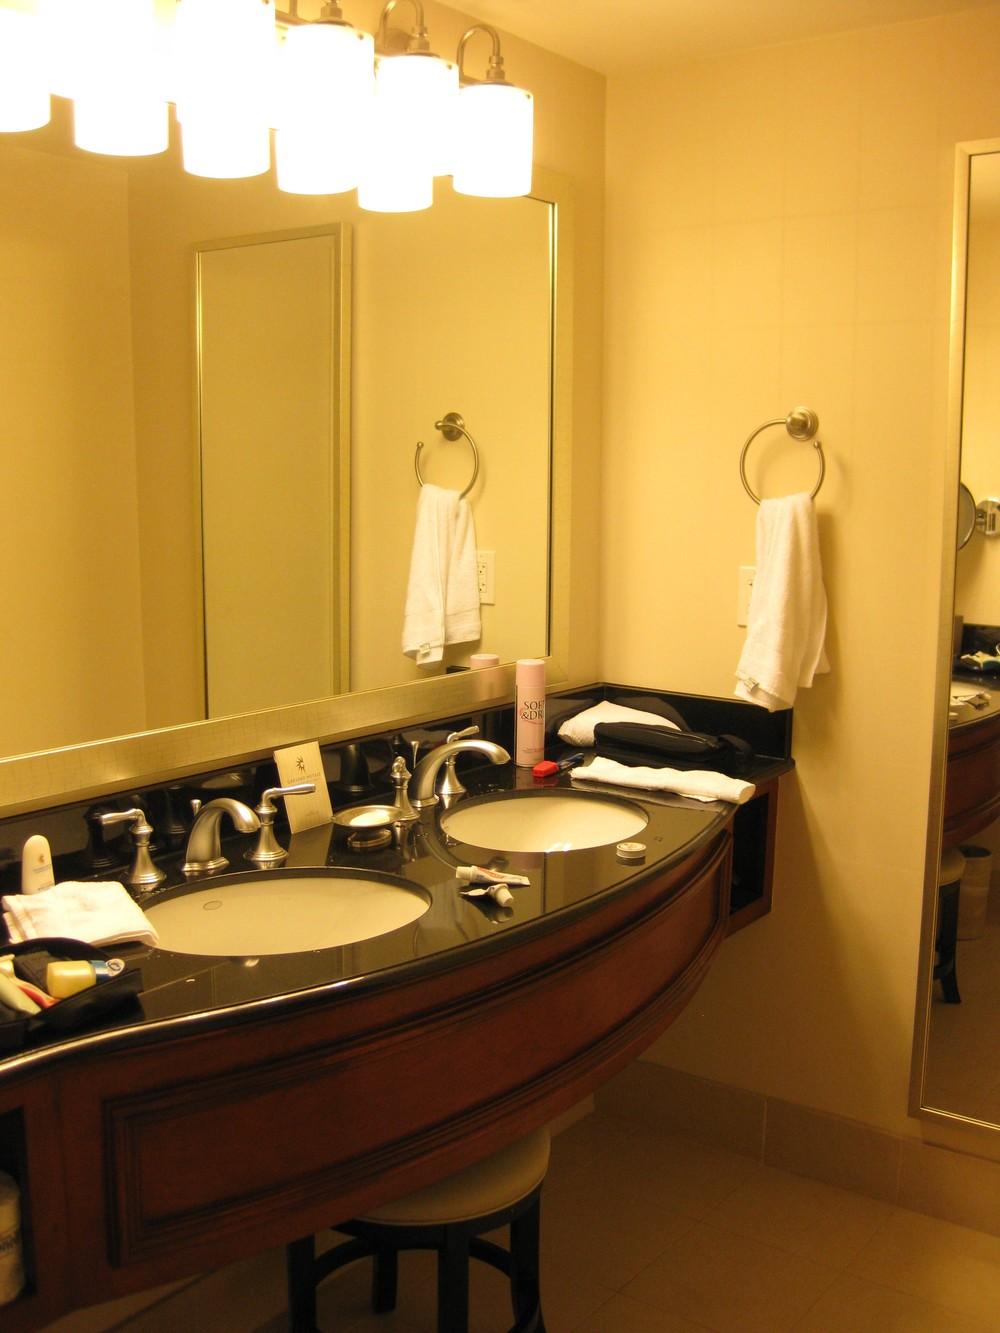 06 - Sinks